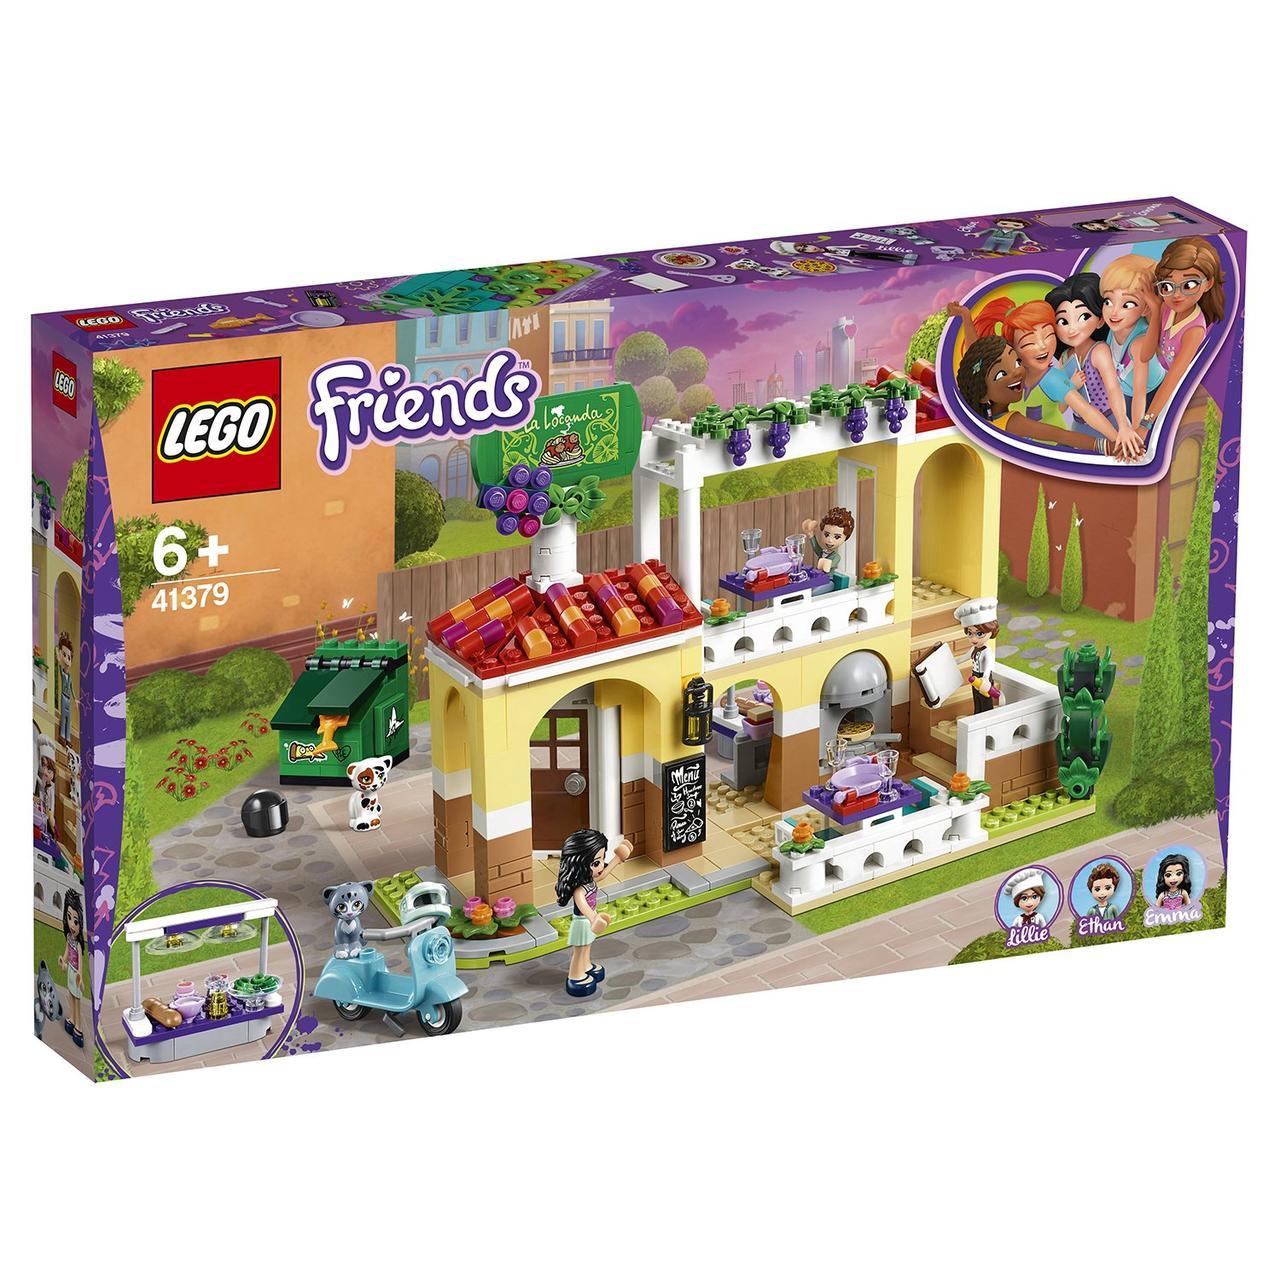 41379 Lego Friends Ресторан Хартлейк Сити, Лего Подружки